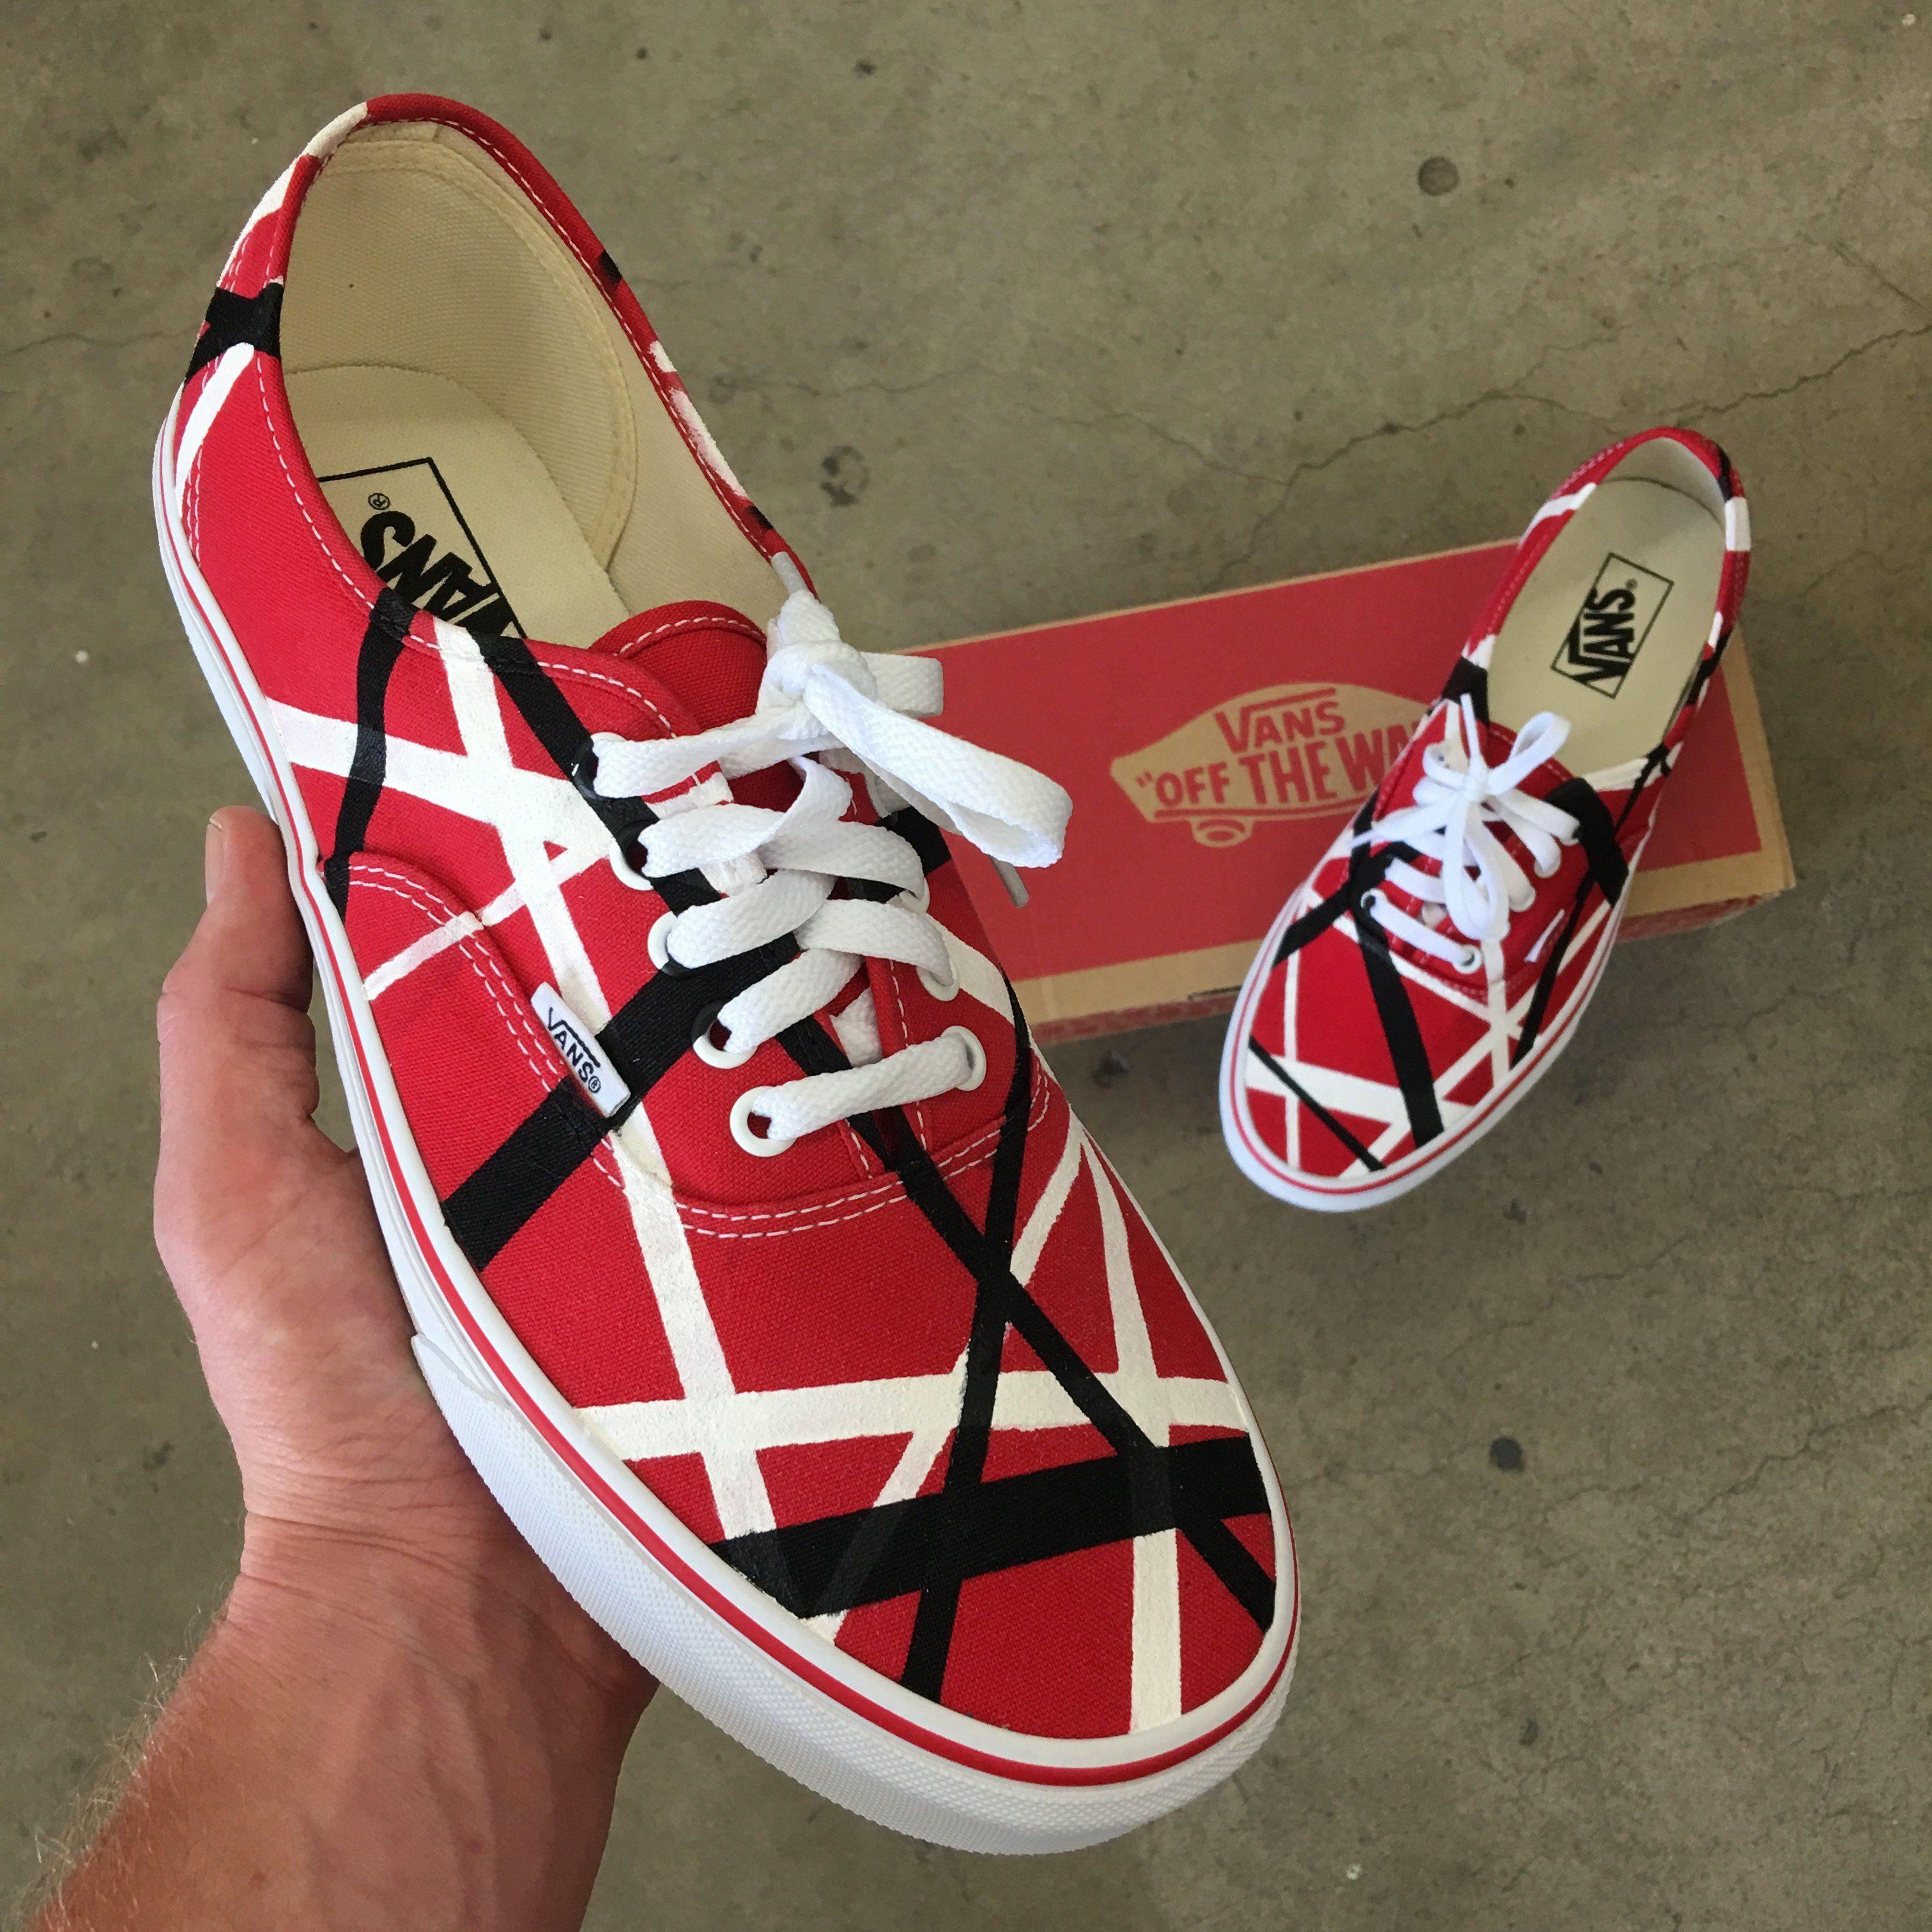 Van Halen Theme Vans Authentic Shoes Vans Authentic Shoes Painted Shoes Painted Shoes Diy